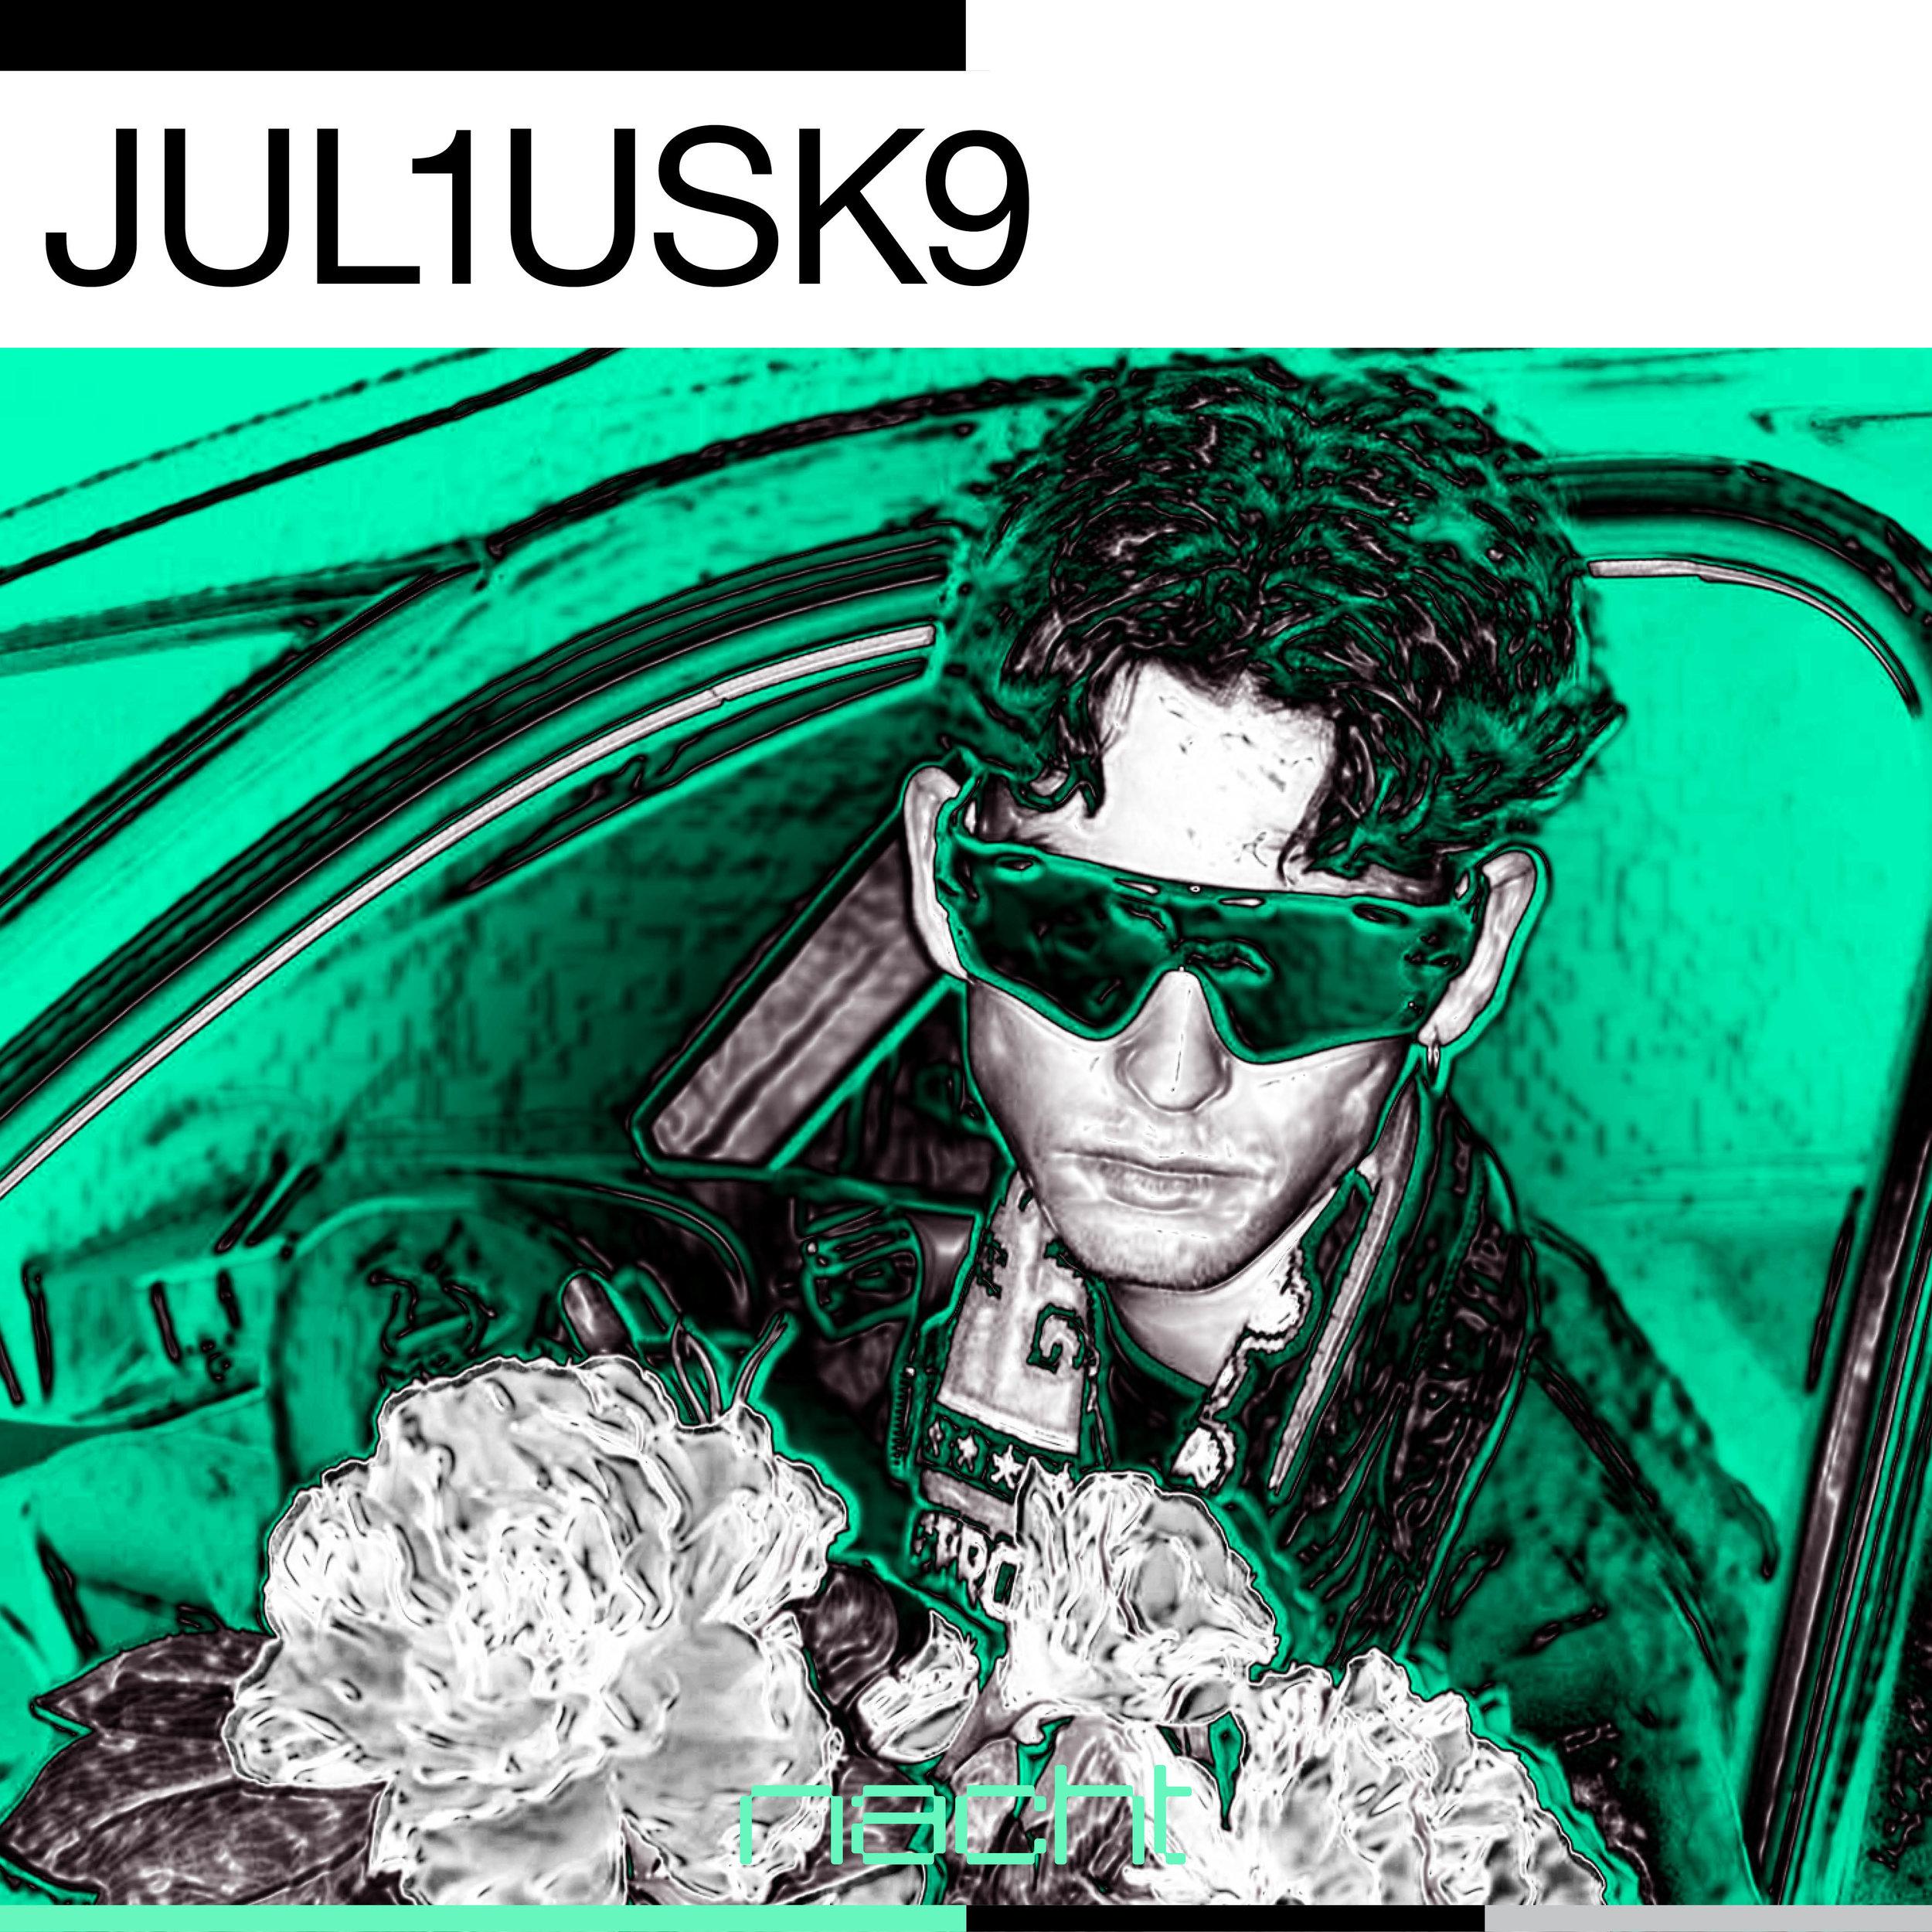 JULIUS 1X1.jpg